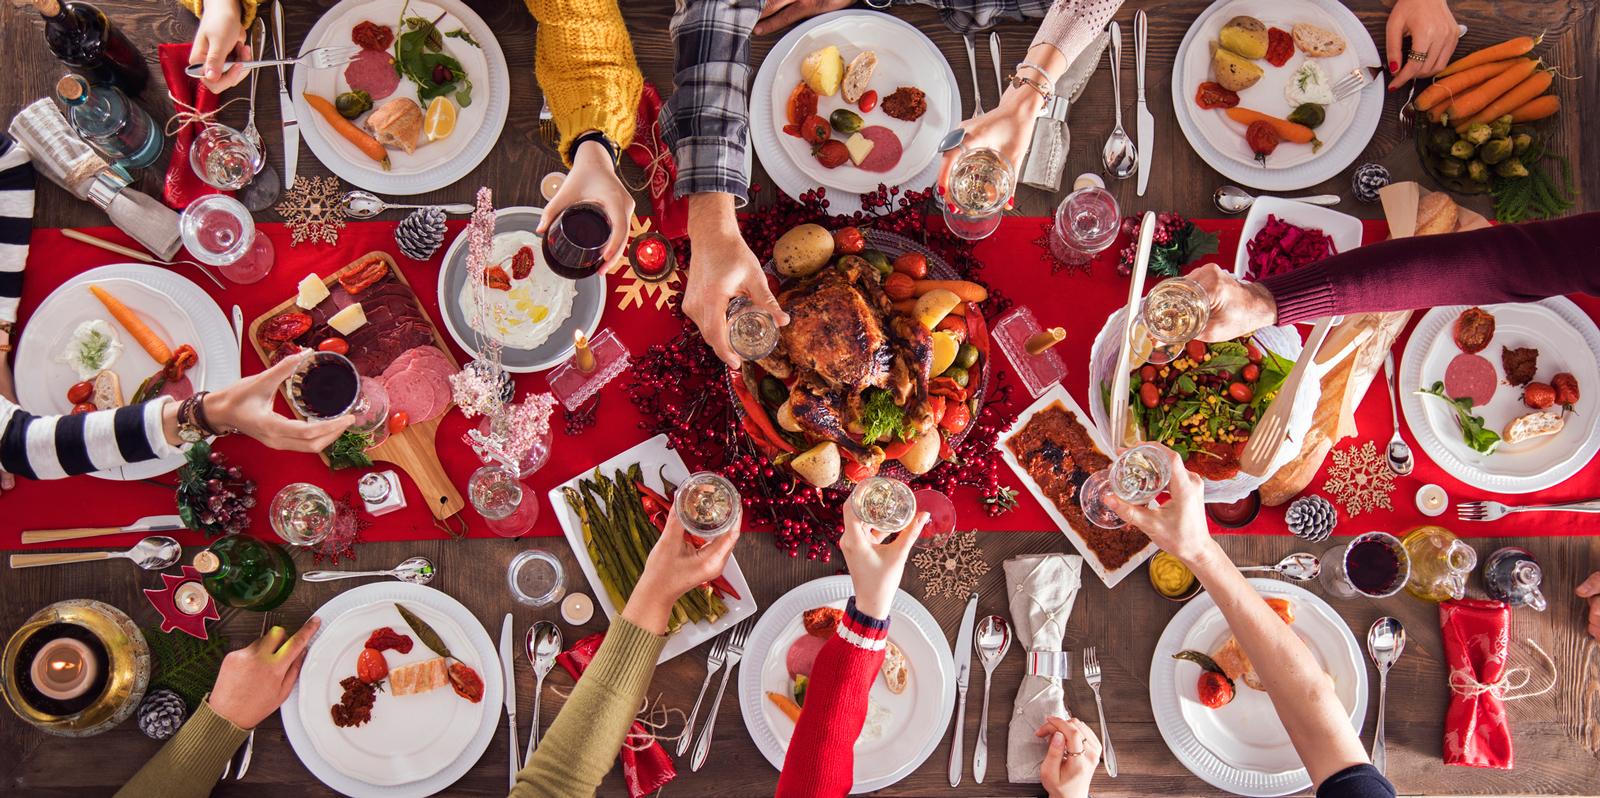 felicità a tavola